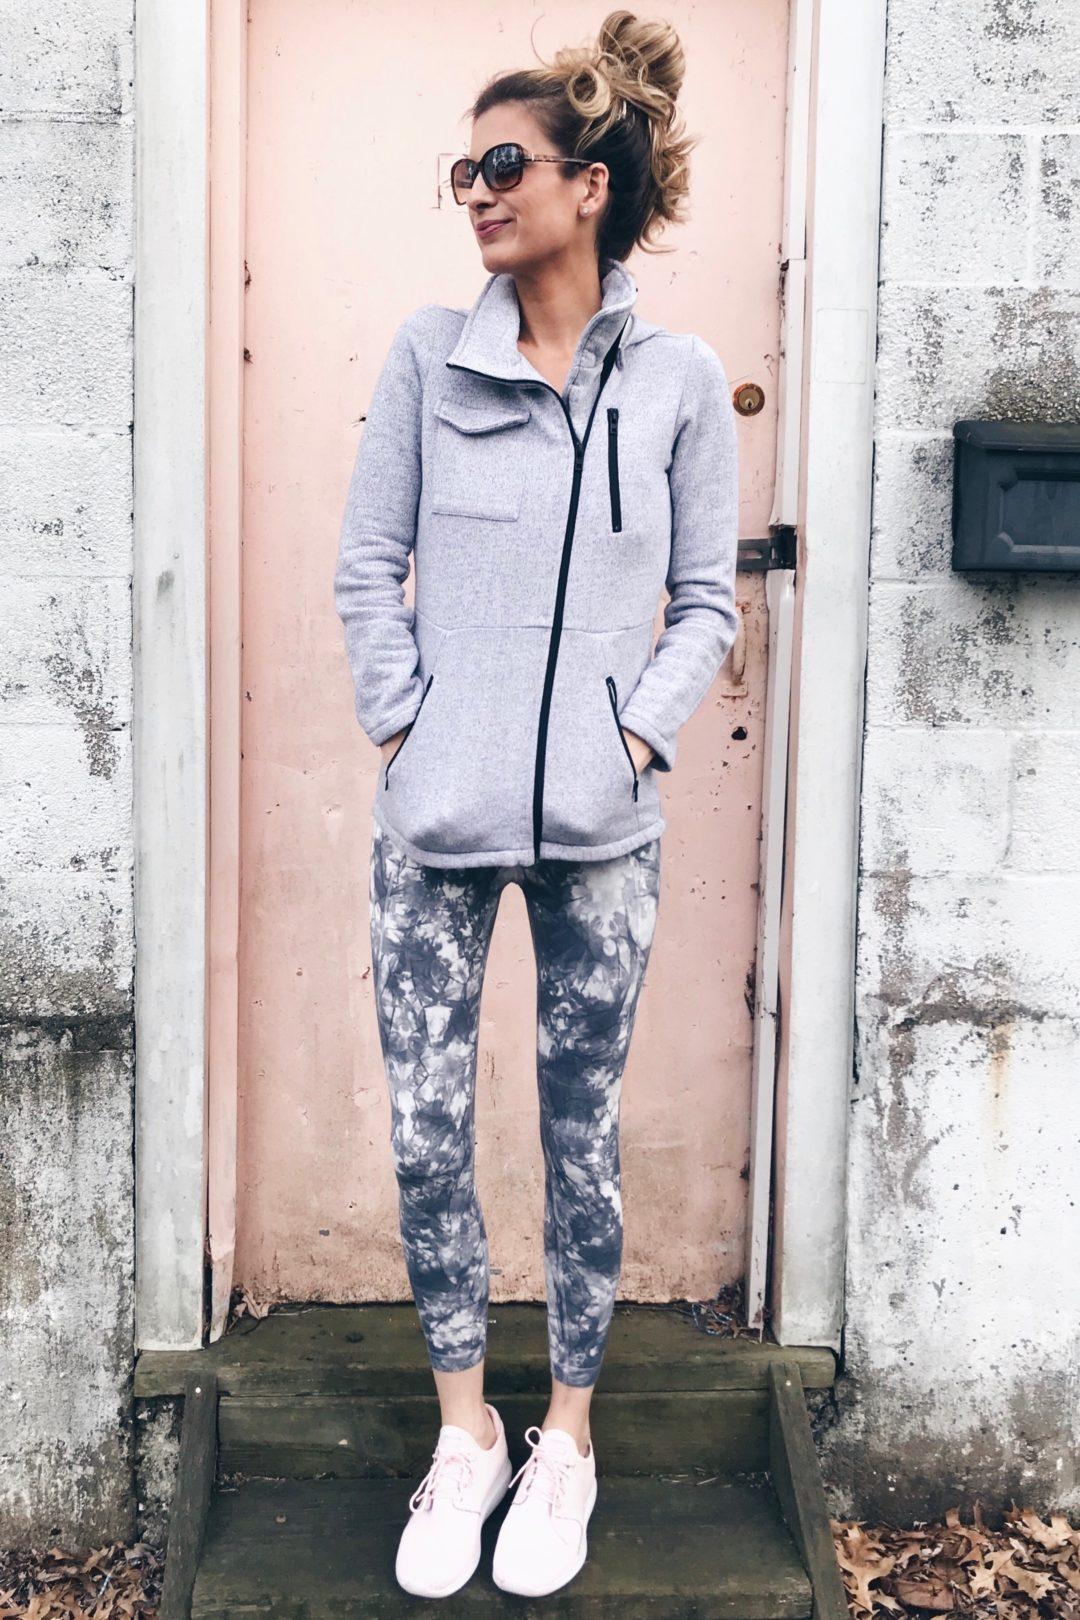 athleisure leggings - tie dye leggings and sweatshirt jacket on pinterestingplans connecticut lifestyle blogger